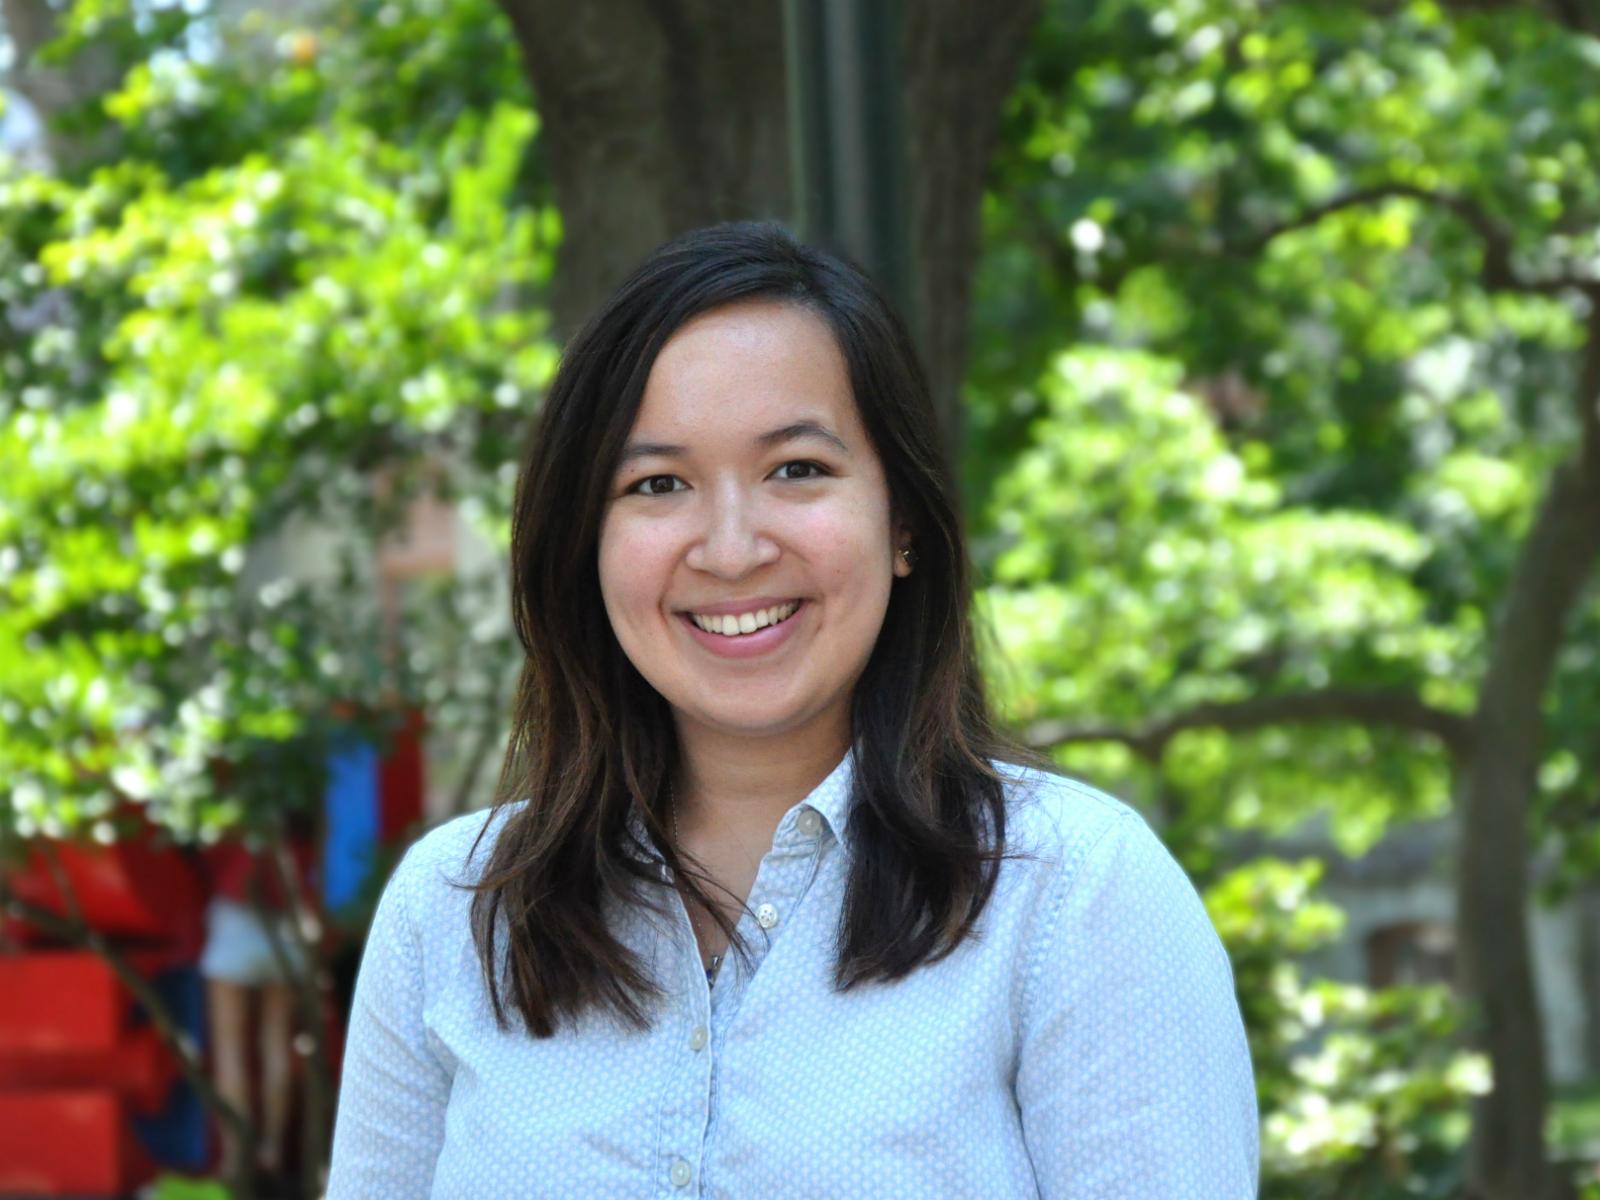 Alumna Emilie Vocaj Wan Bok Nale is one of the CASE Advancement interns.